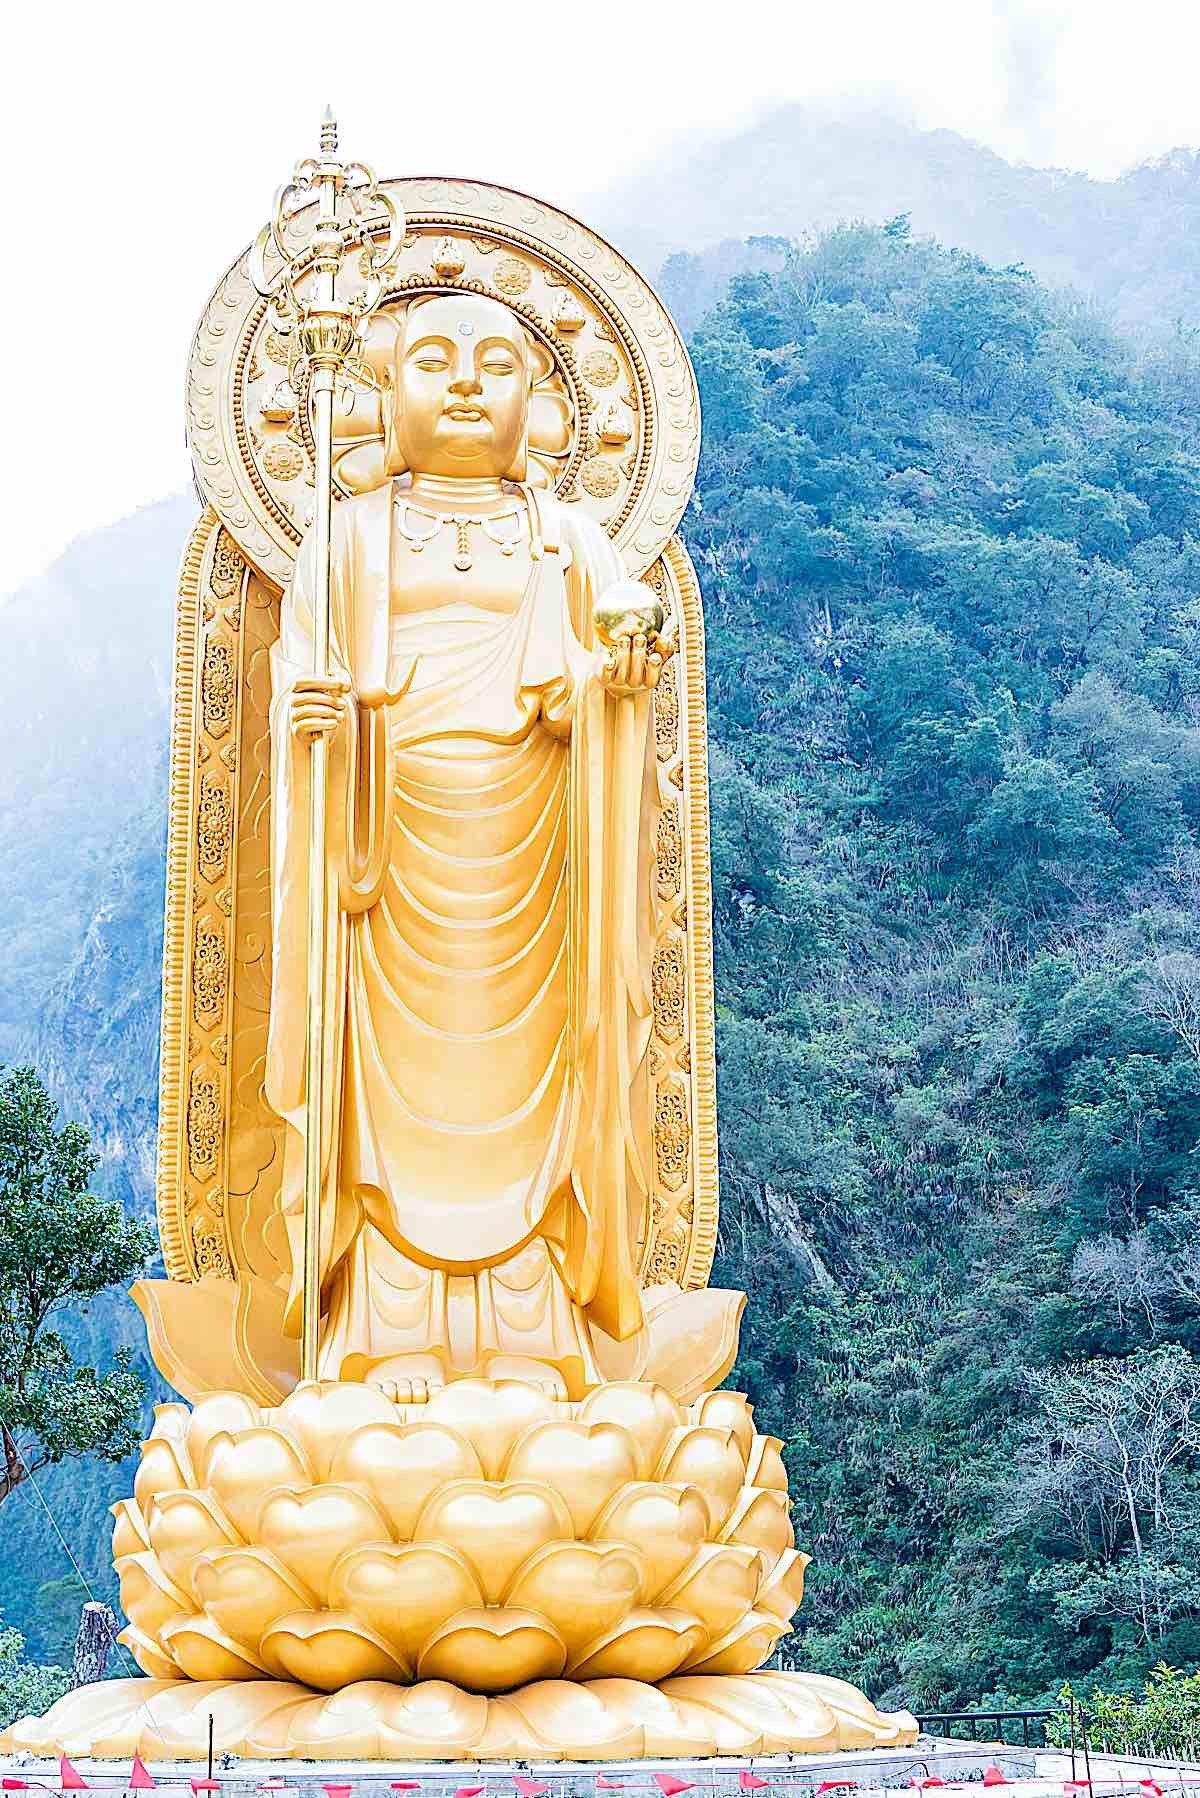 Buddha Weekly Kshitigarbha Statue at Xiangde Temple Taroko National Park Hualien Taiwan dreamstime xxl 90754042 Buddhism